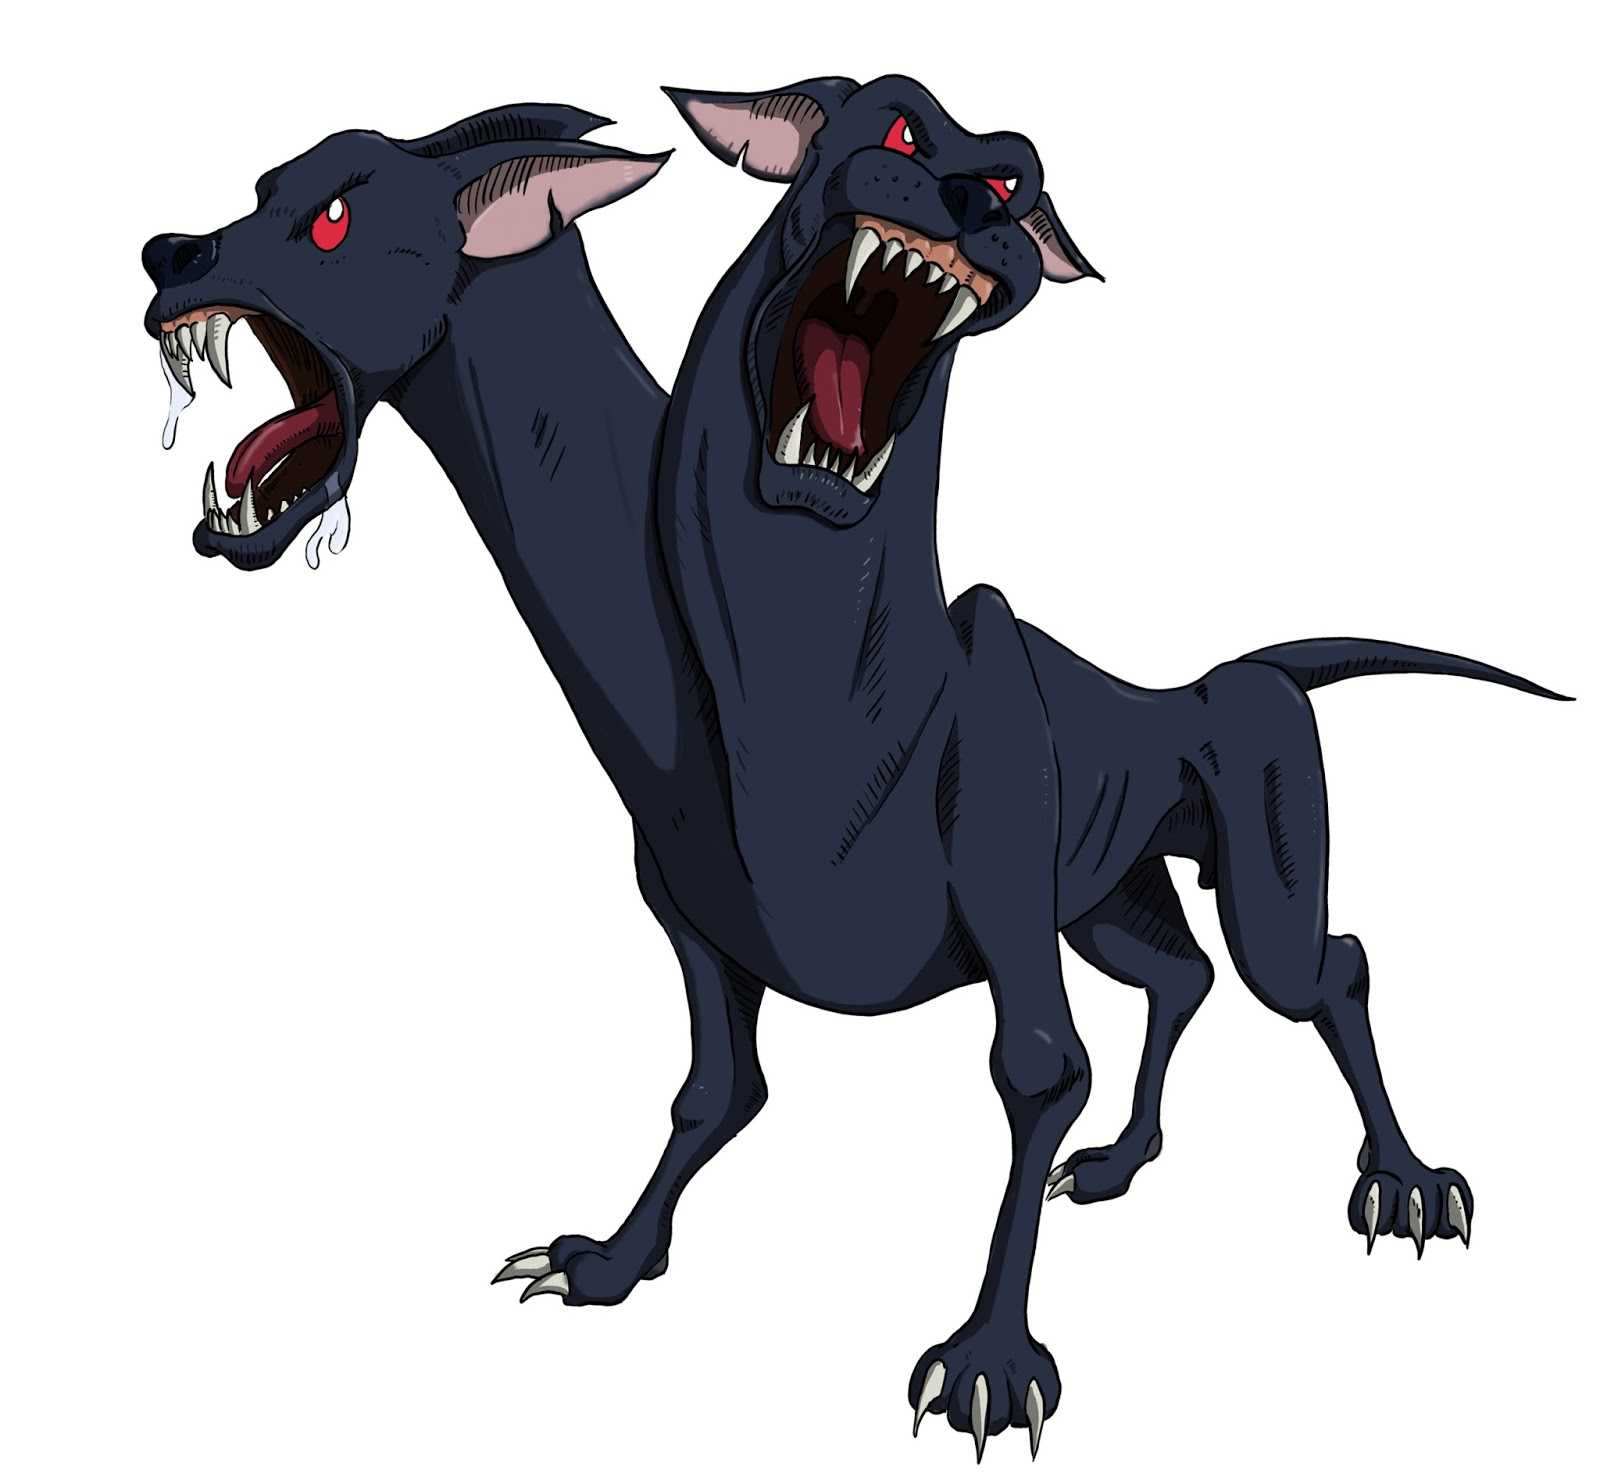 d&d death dog